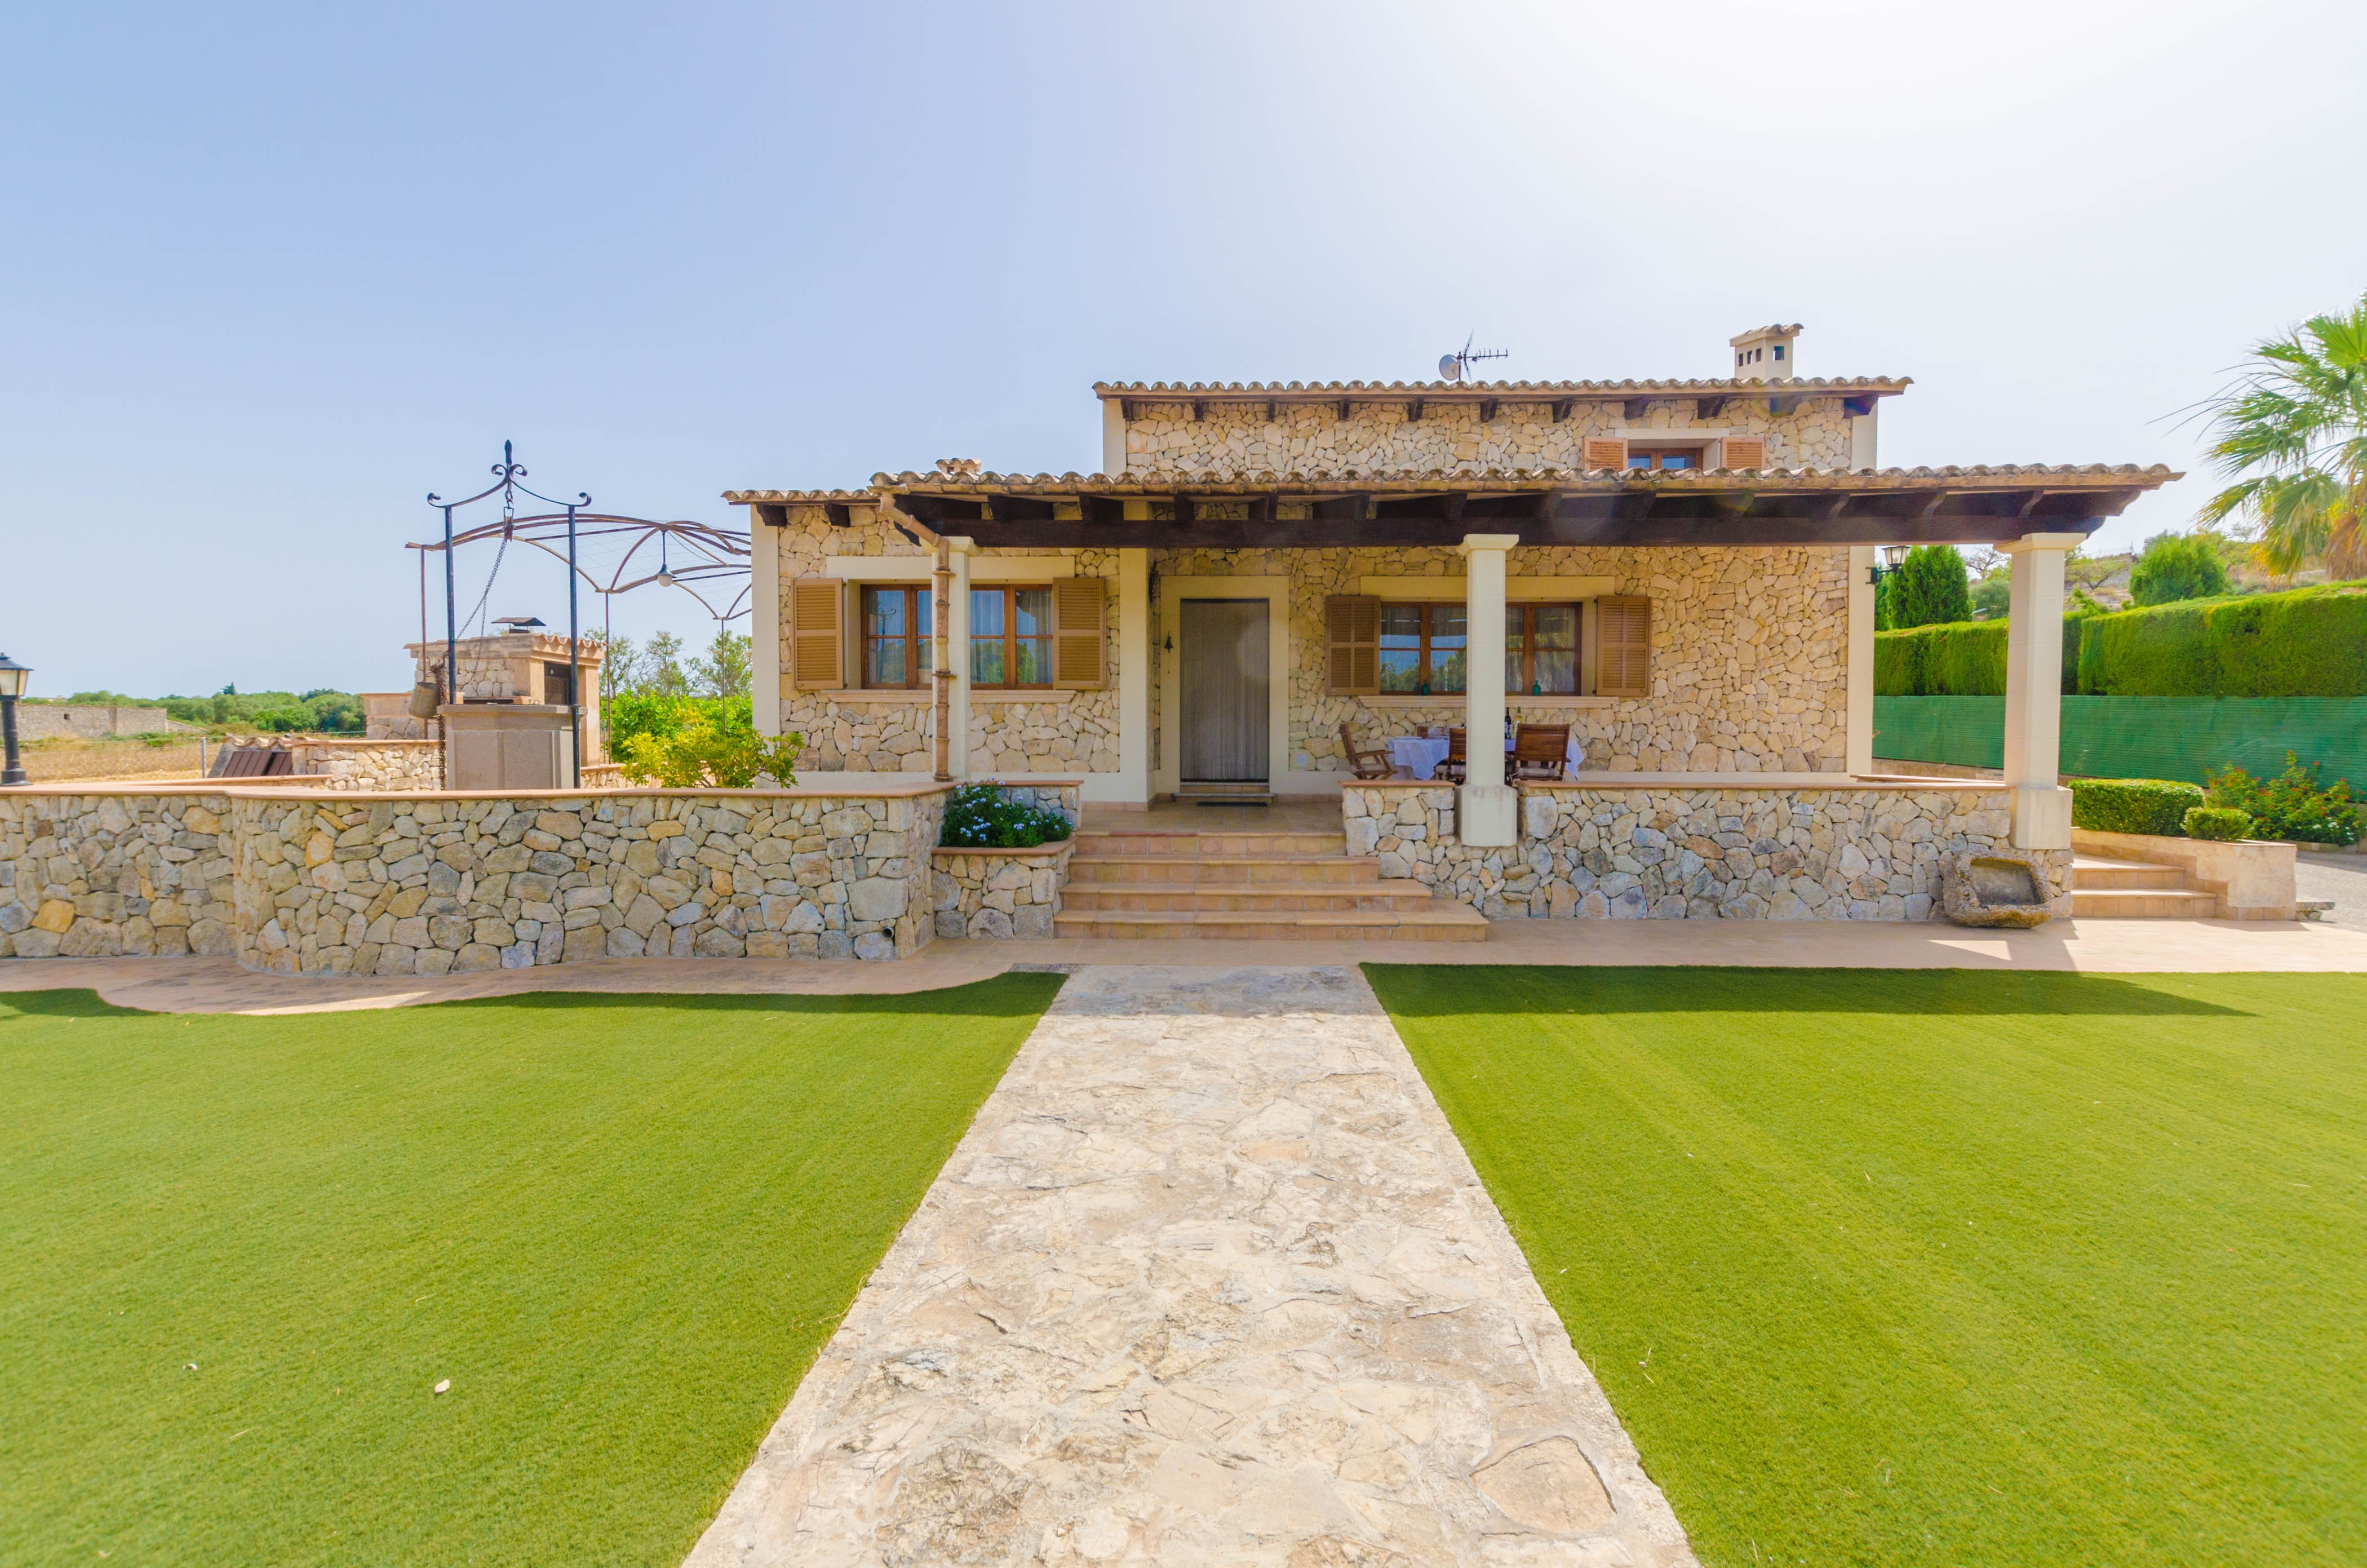 Maison de vacances SA SINIA (2374876), Lloret de Vistalegre, Majorque, Iles Baléares, Espagne, image 51